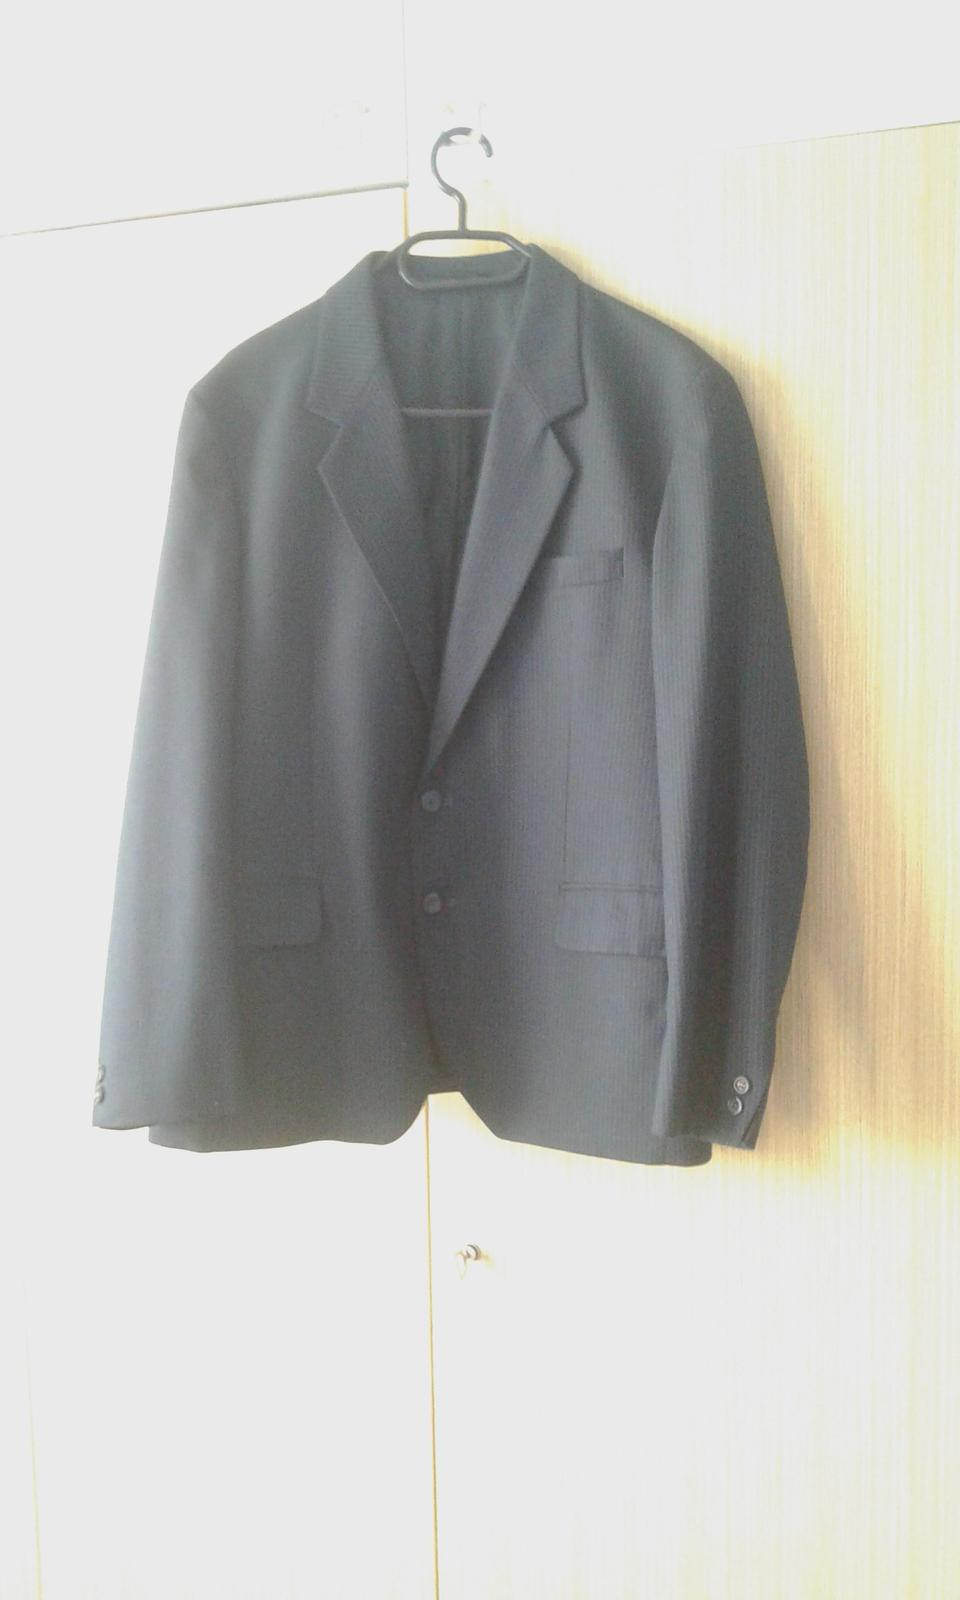 Pánsky starší oblek - Obrázok č. 1